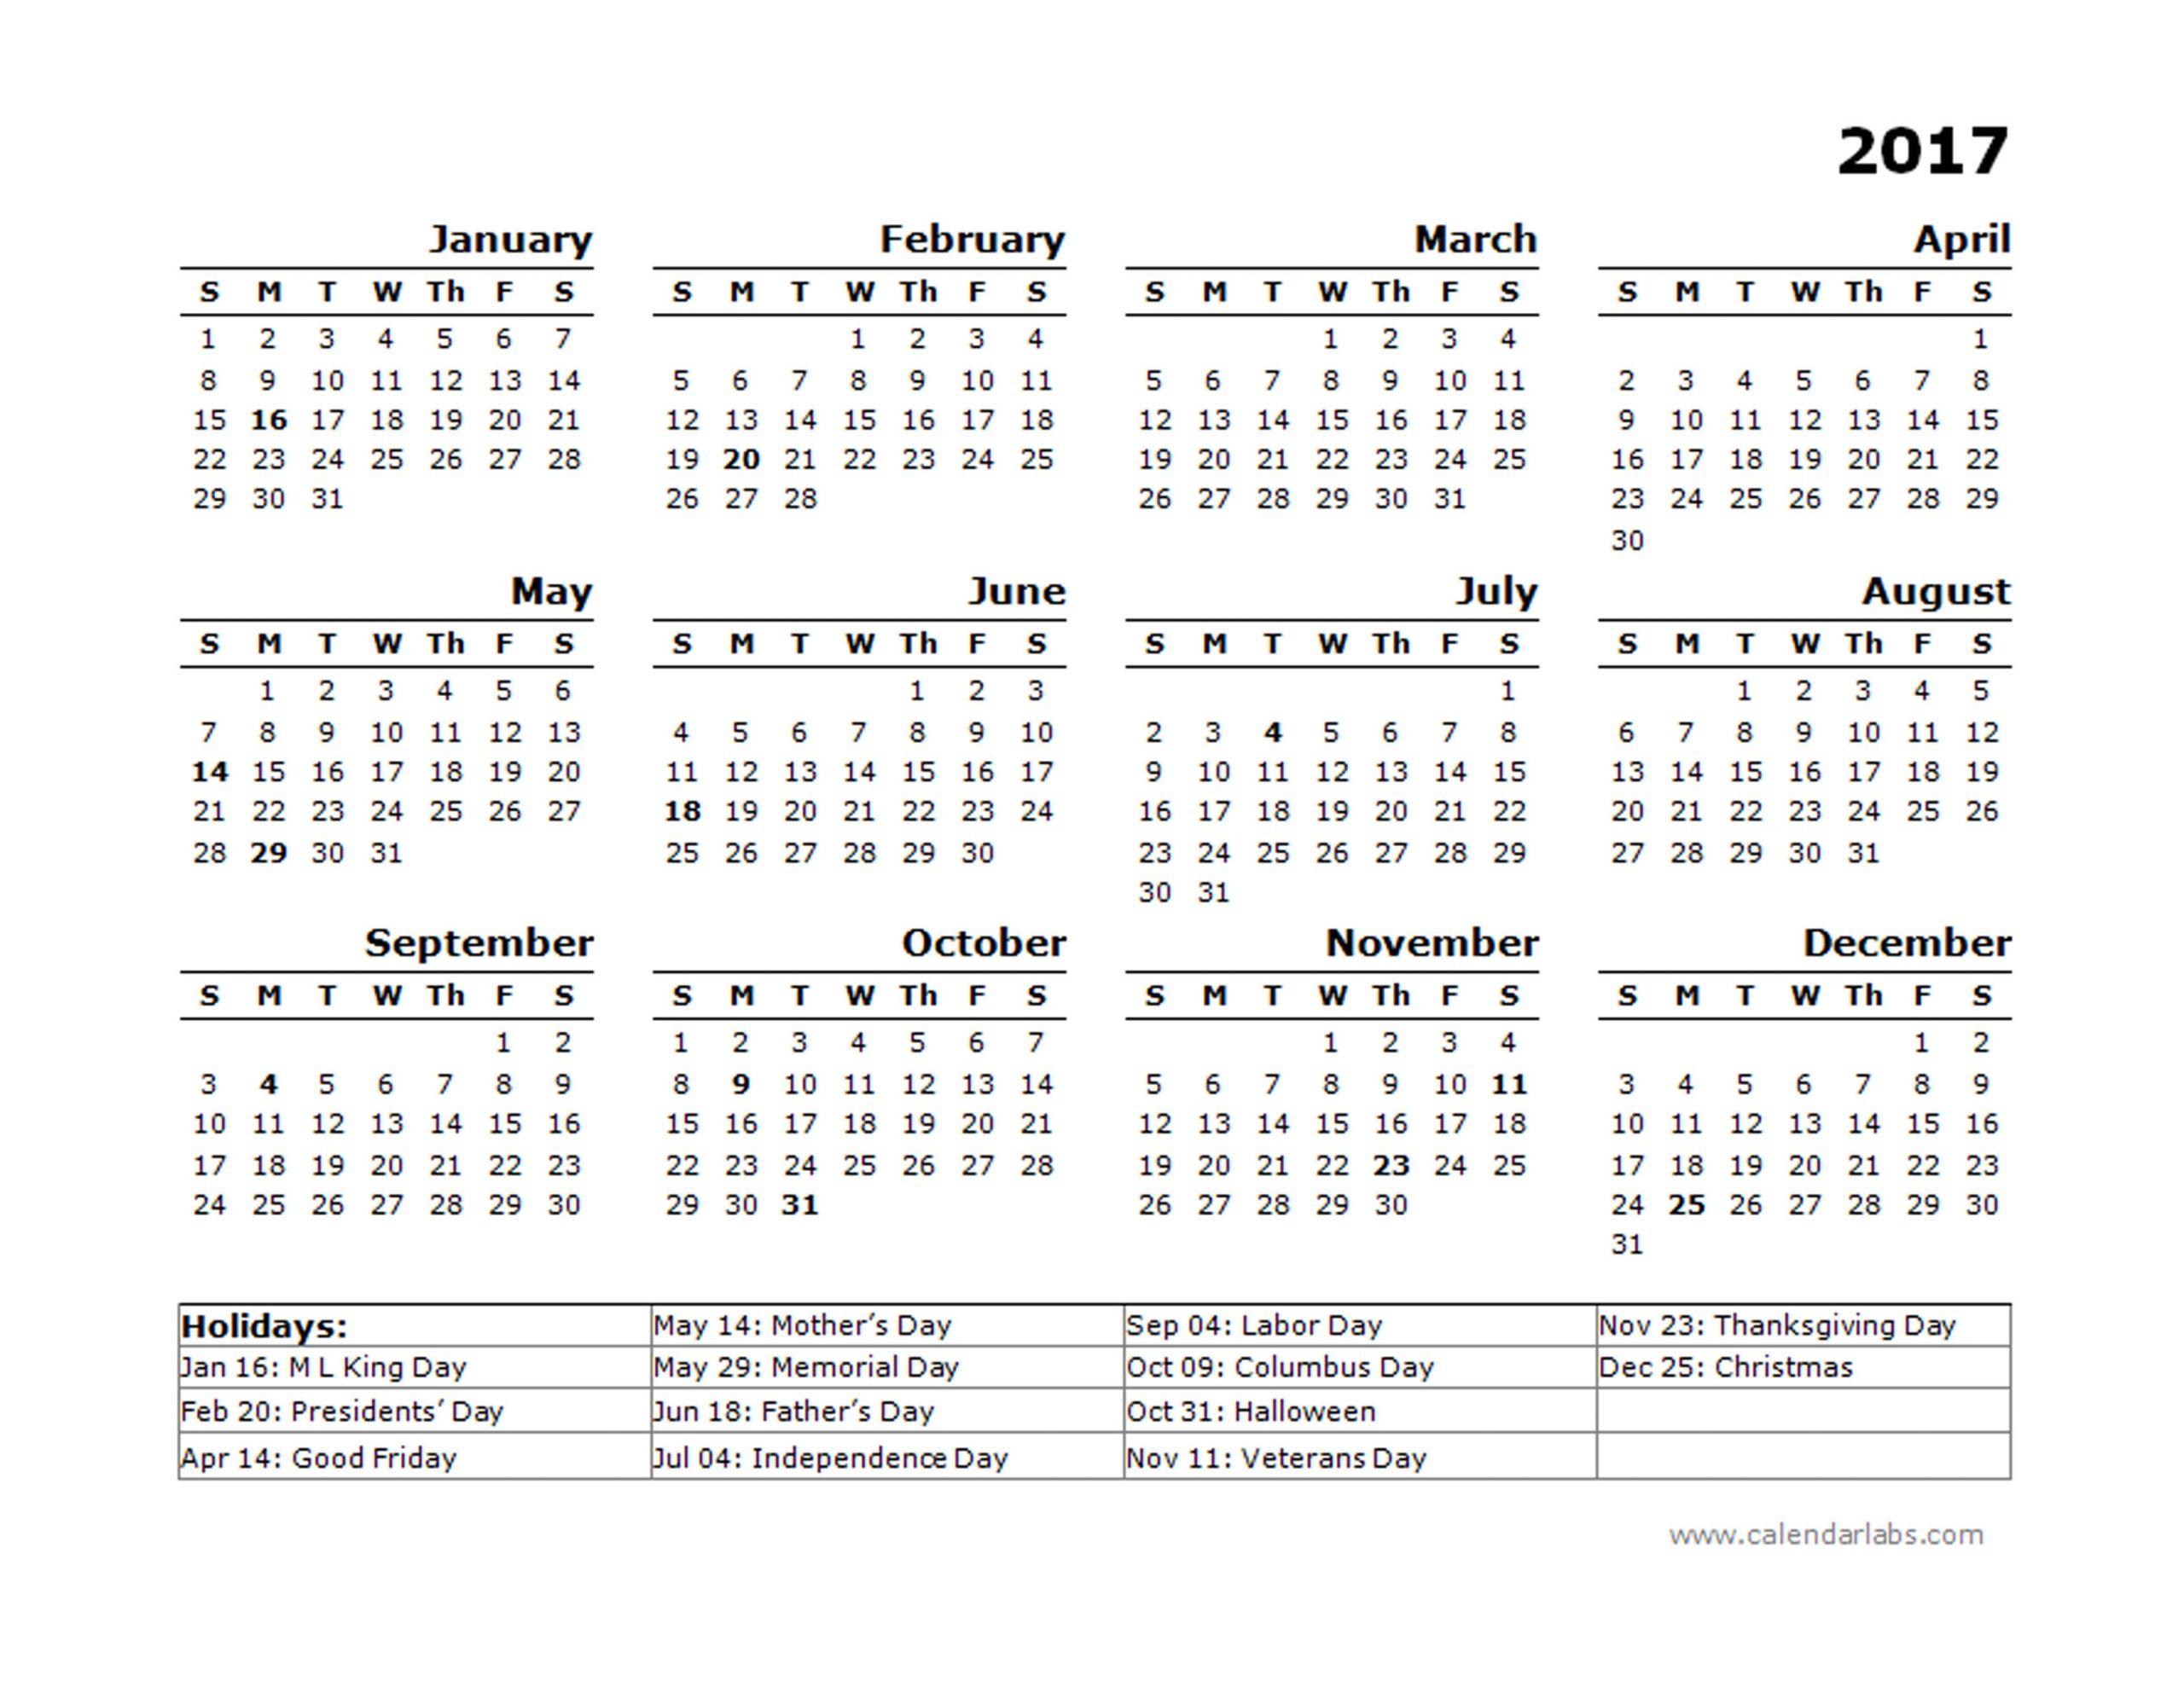 2017 Calendar Template Cyberuse